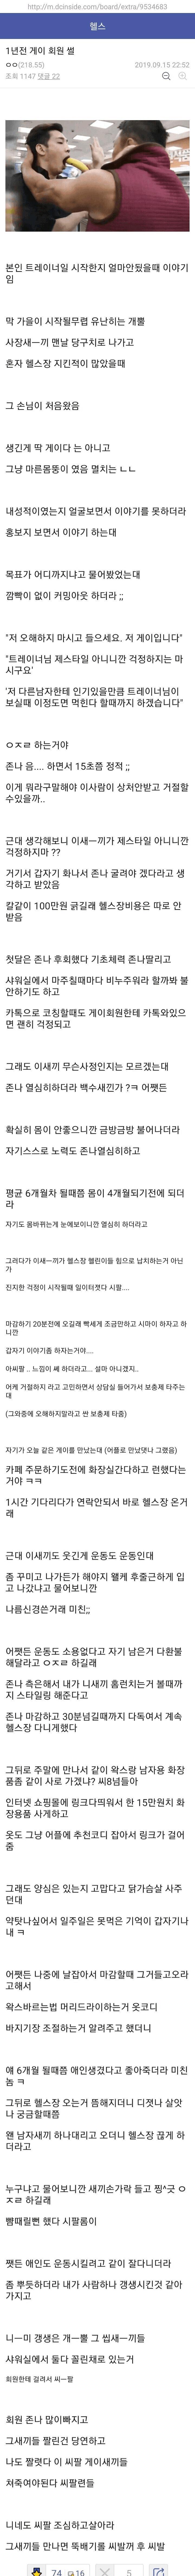 image.png 은혜갚은 헬스장 게이썰